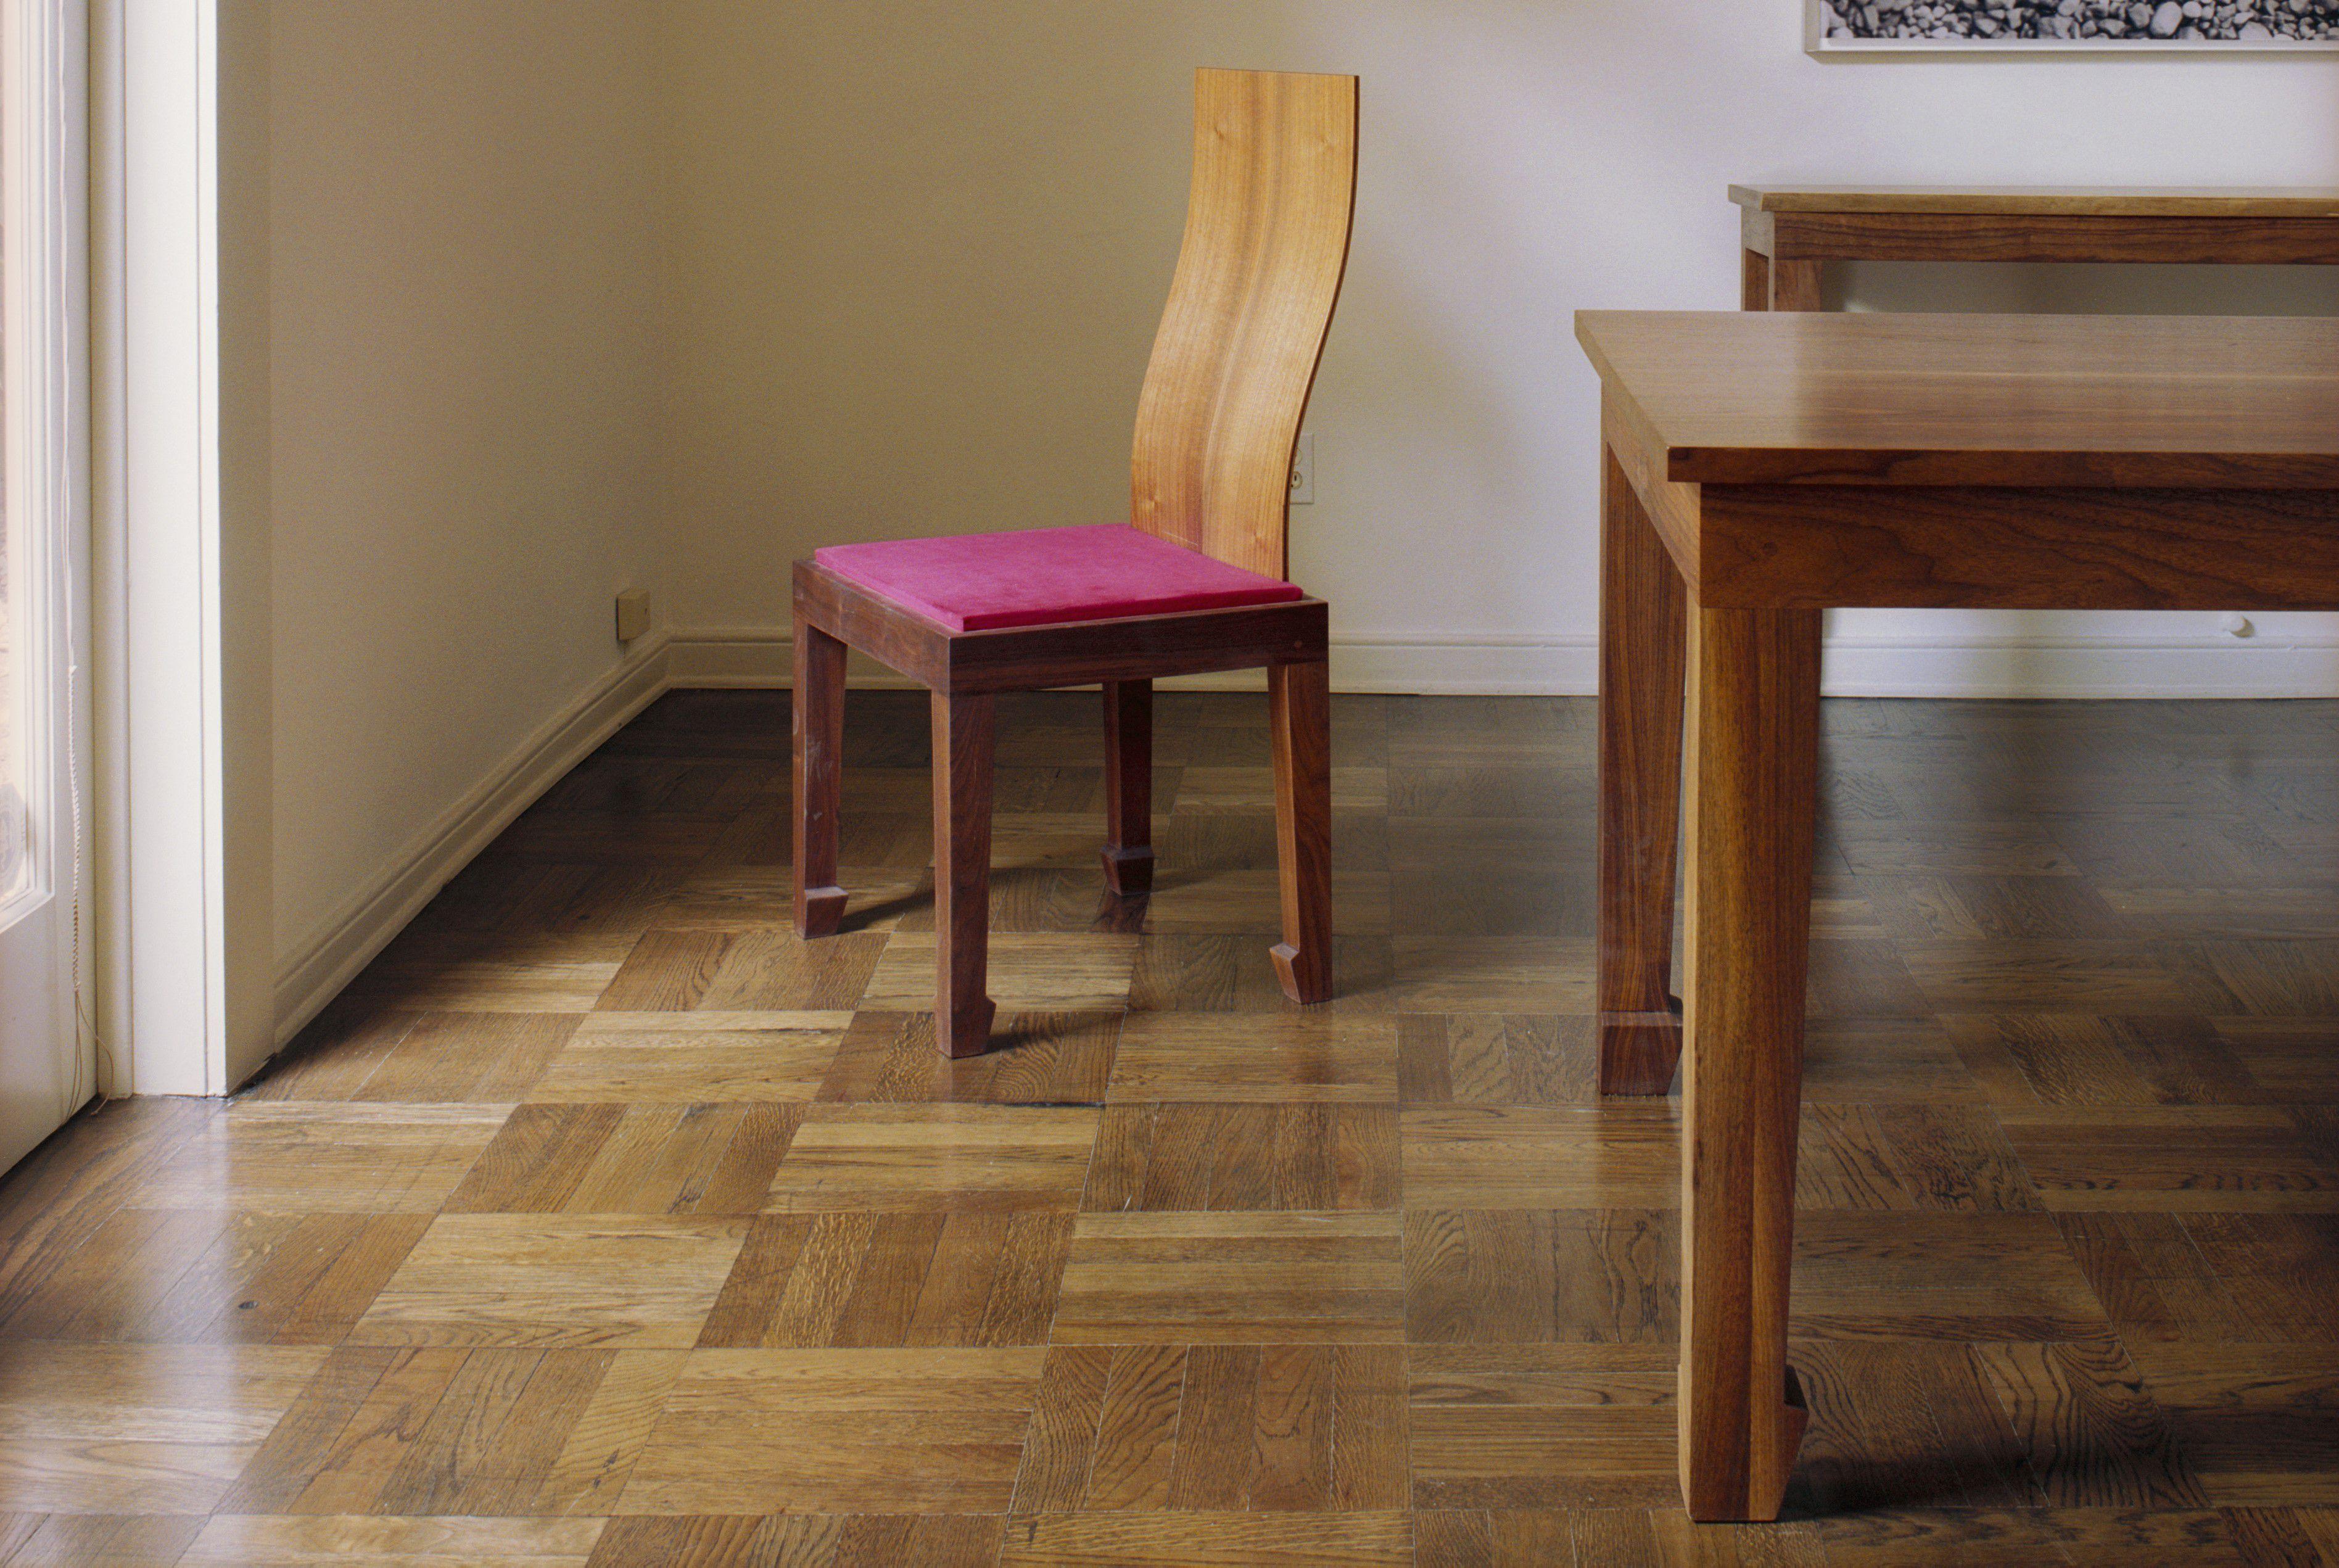 hardwood floor restoration toronto of wood parquet flooring poised for a resurgence with wood parquet flooring 529502452 576c78195f9b585875a1ac13